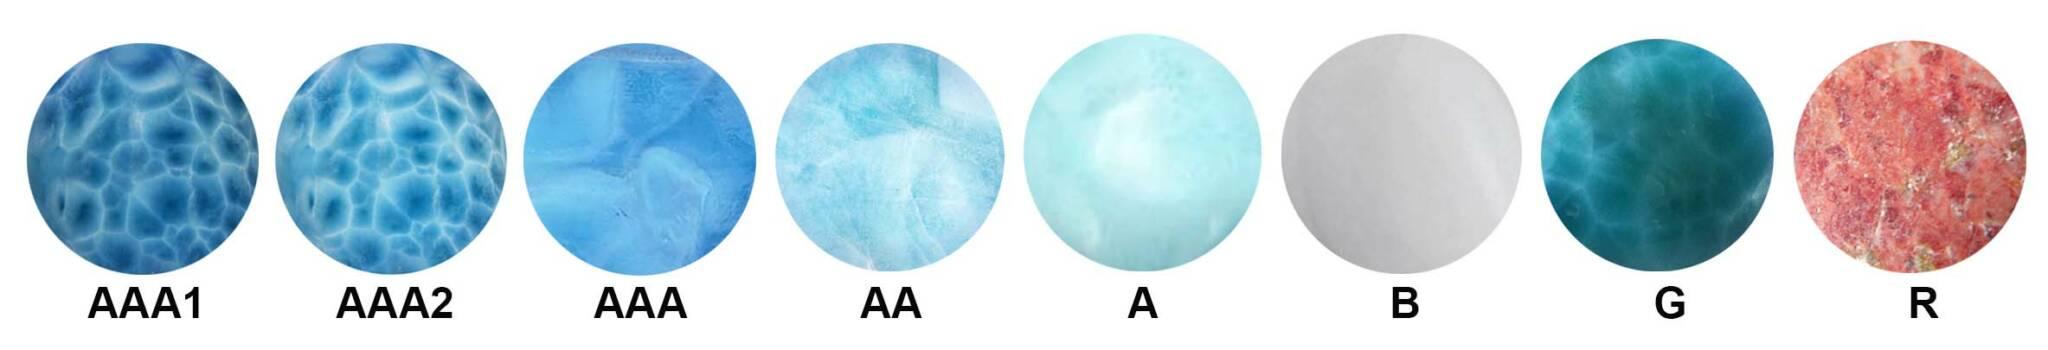 Larimar-color chart grading larimar